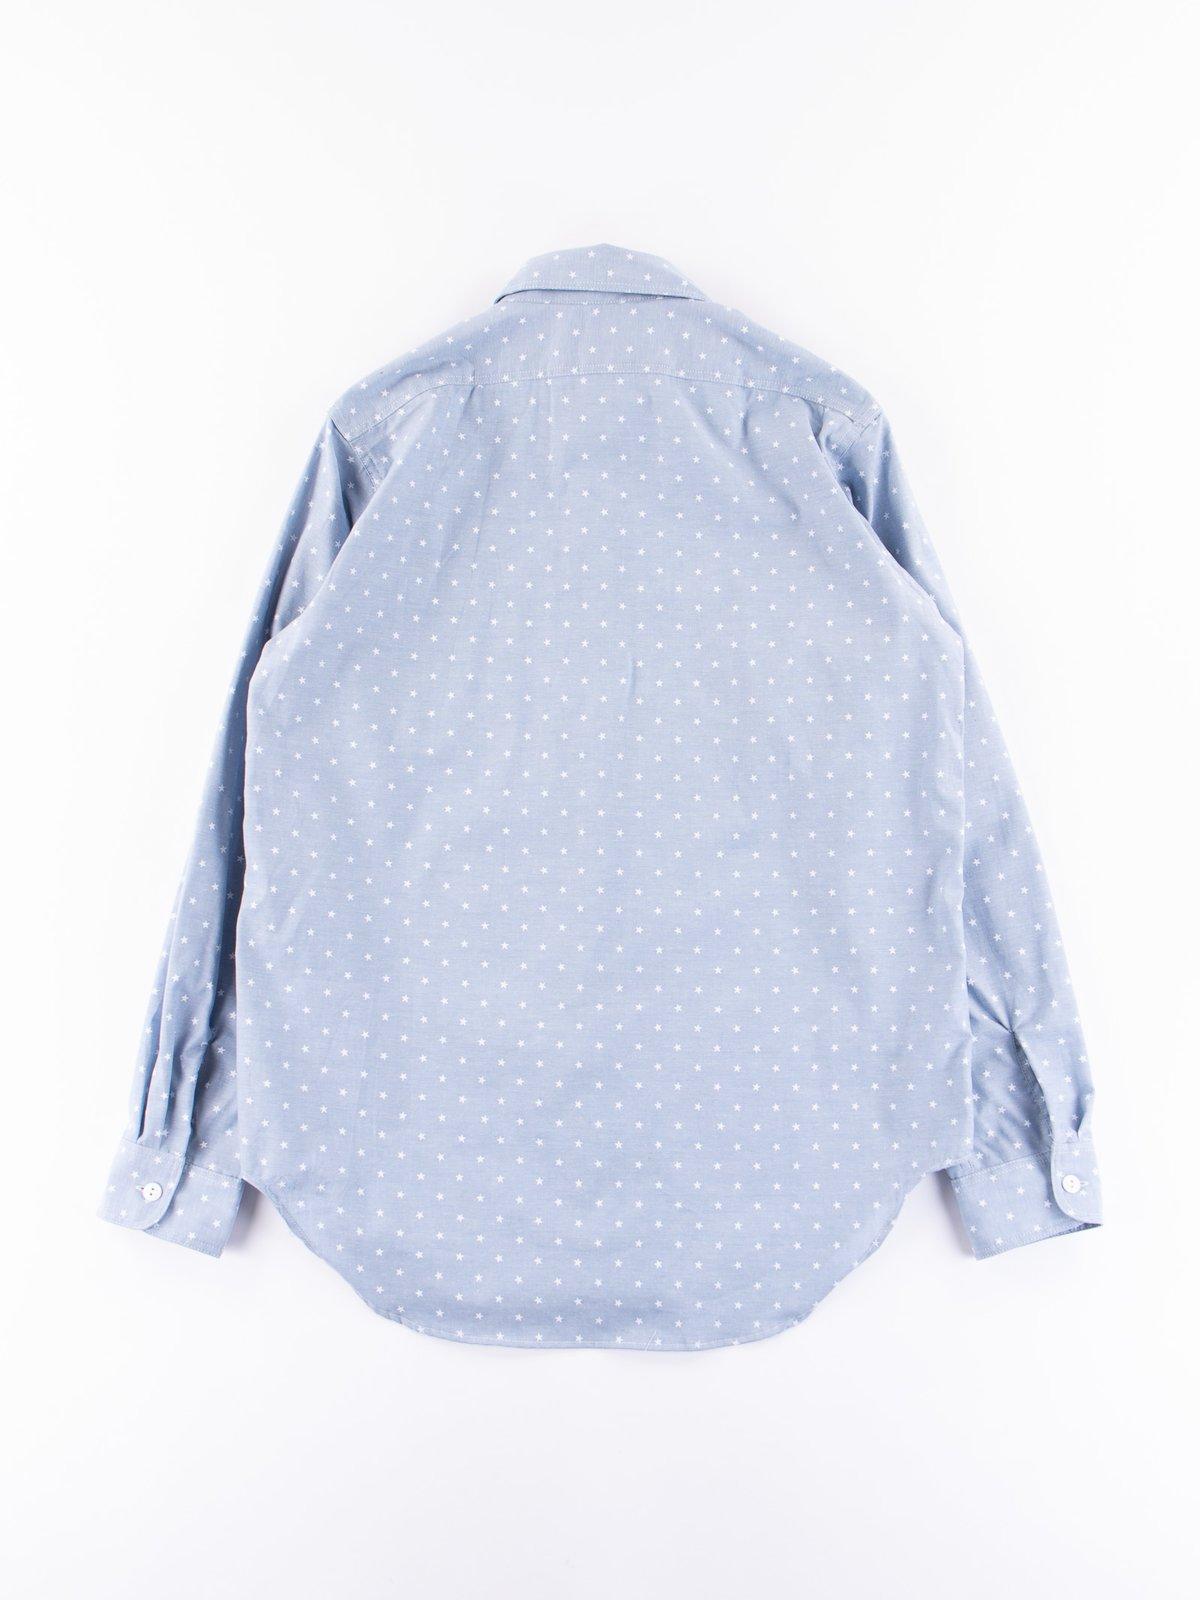 Light Blue Star Chambray Utility Shirt - Image 5